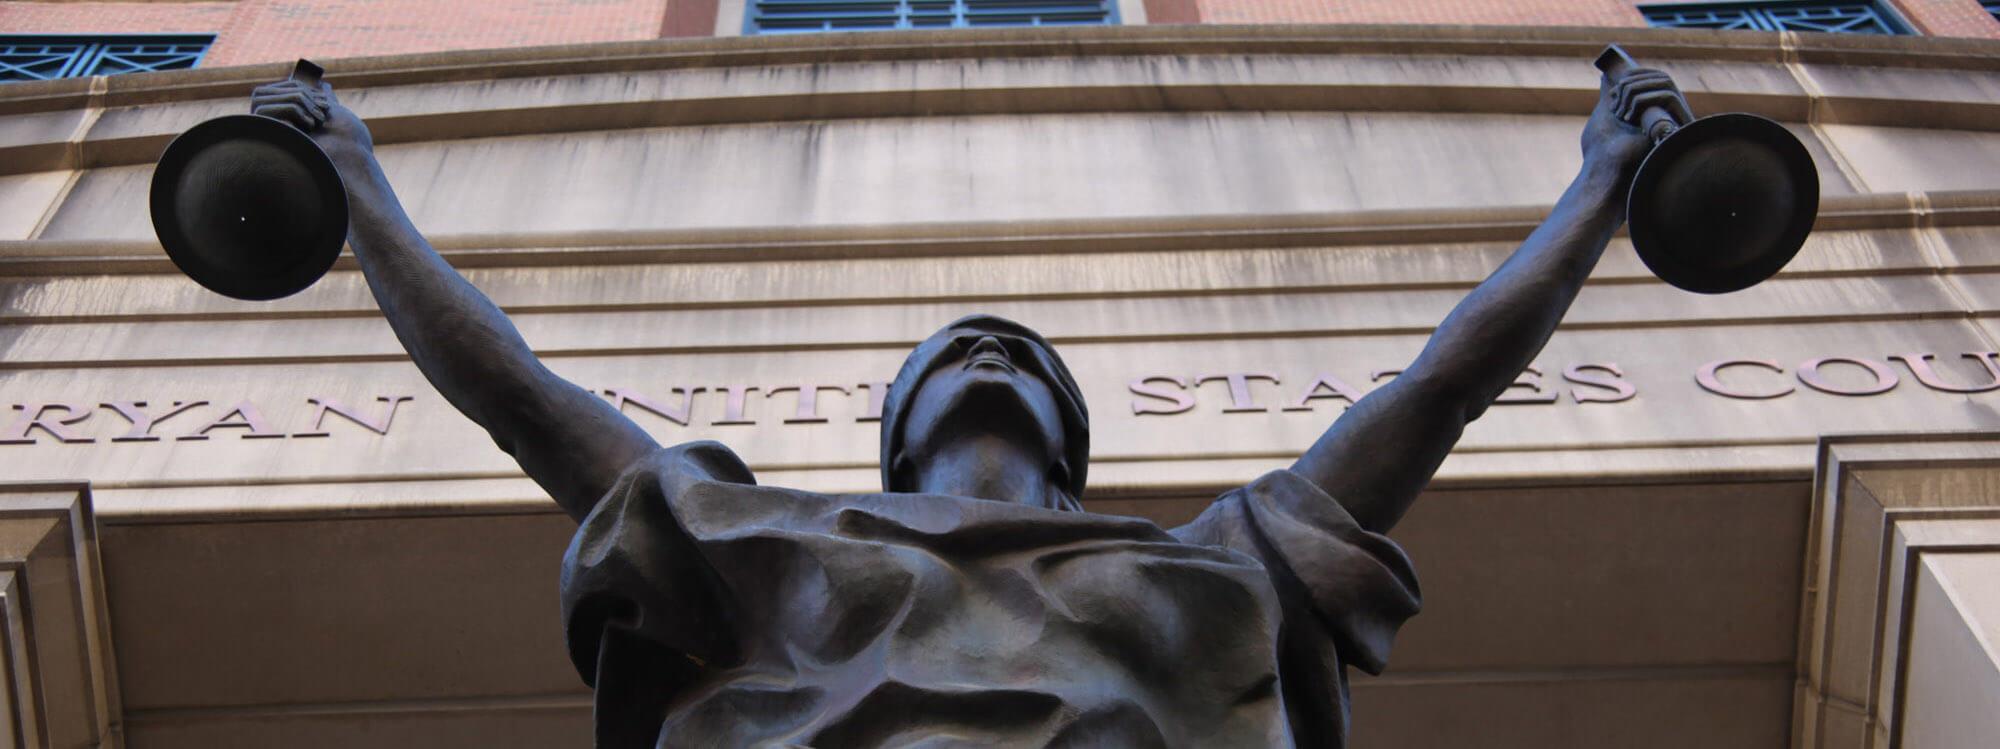 Evolving and renewing antitrust standards